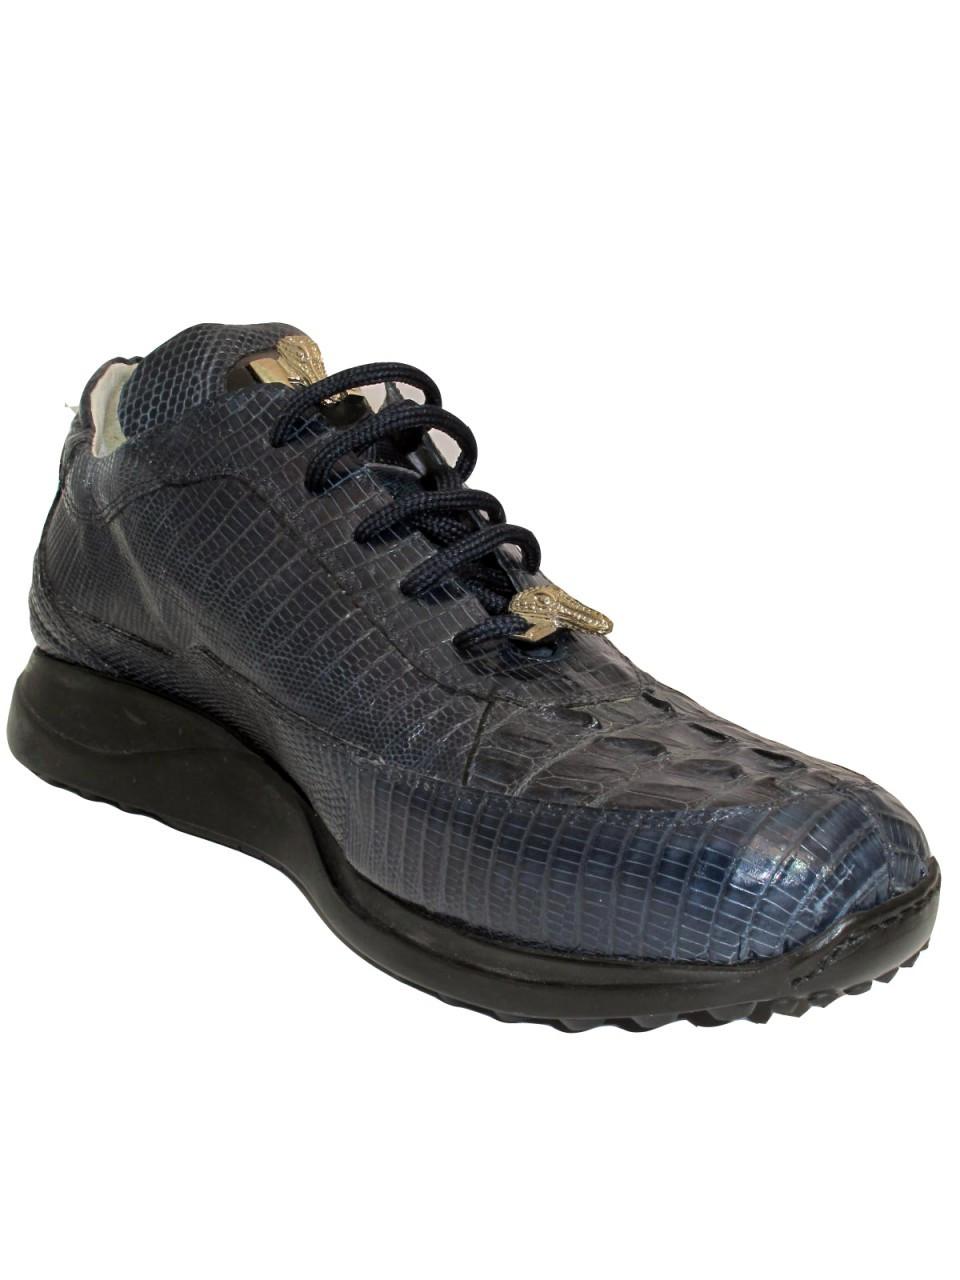 Men's Mauri shoe sneakers Ostrich leg